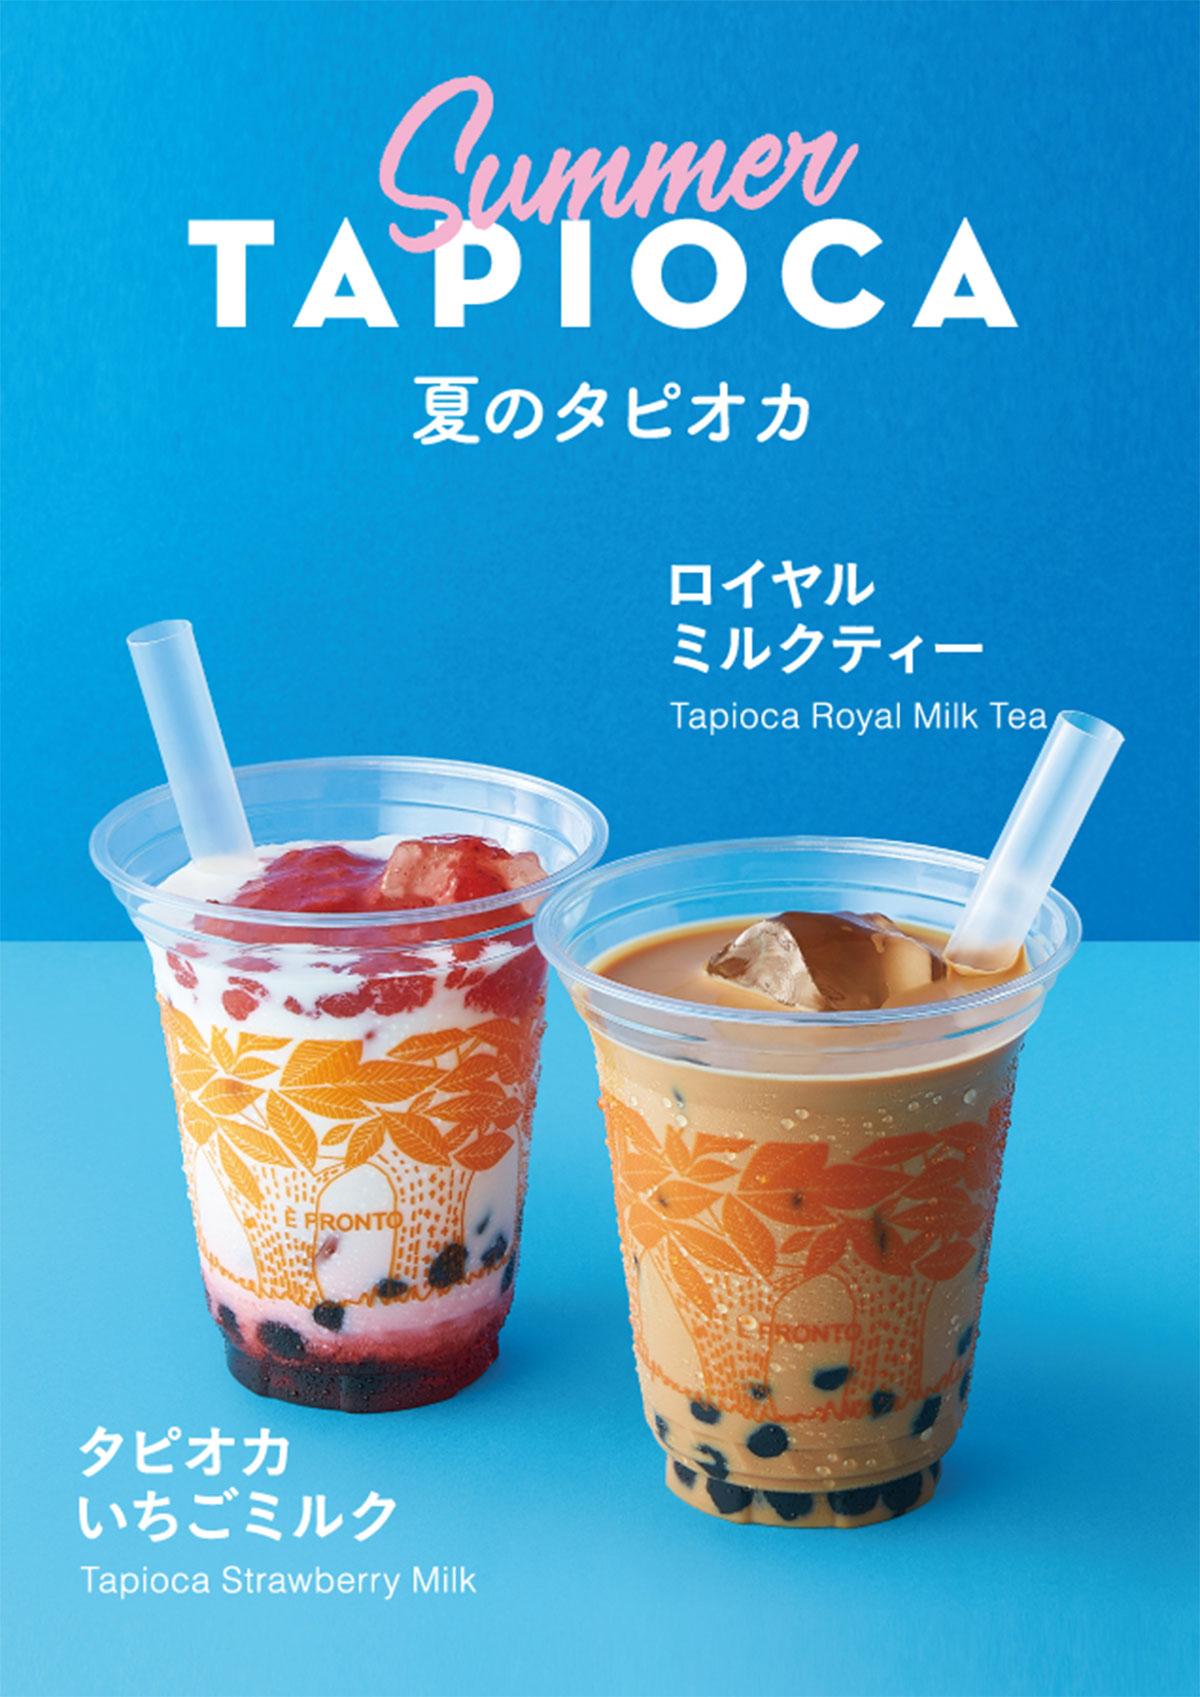 E PRONTO(エ・プロント)ららぽーと海老名店のタピオカドリンク